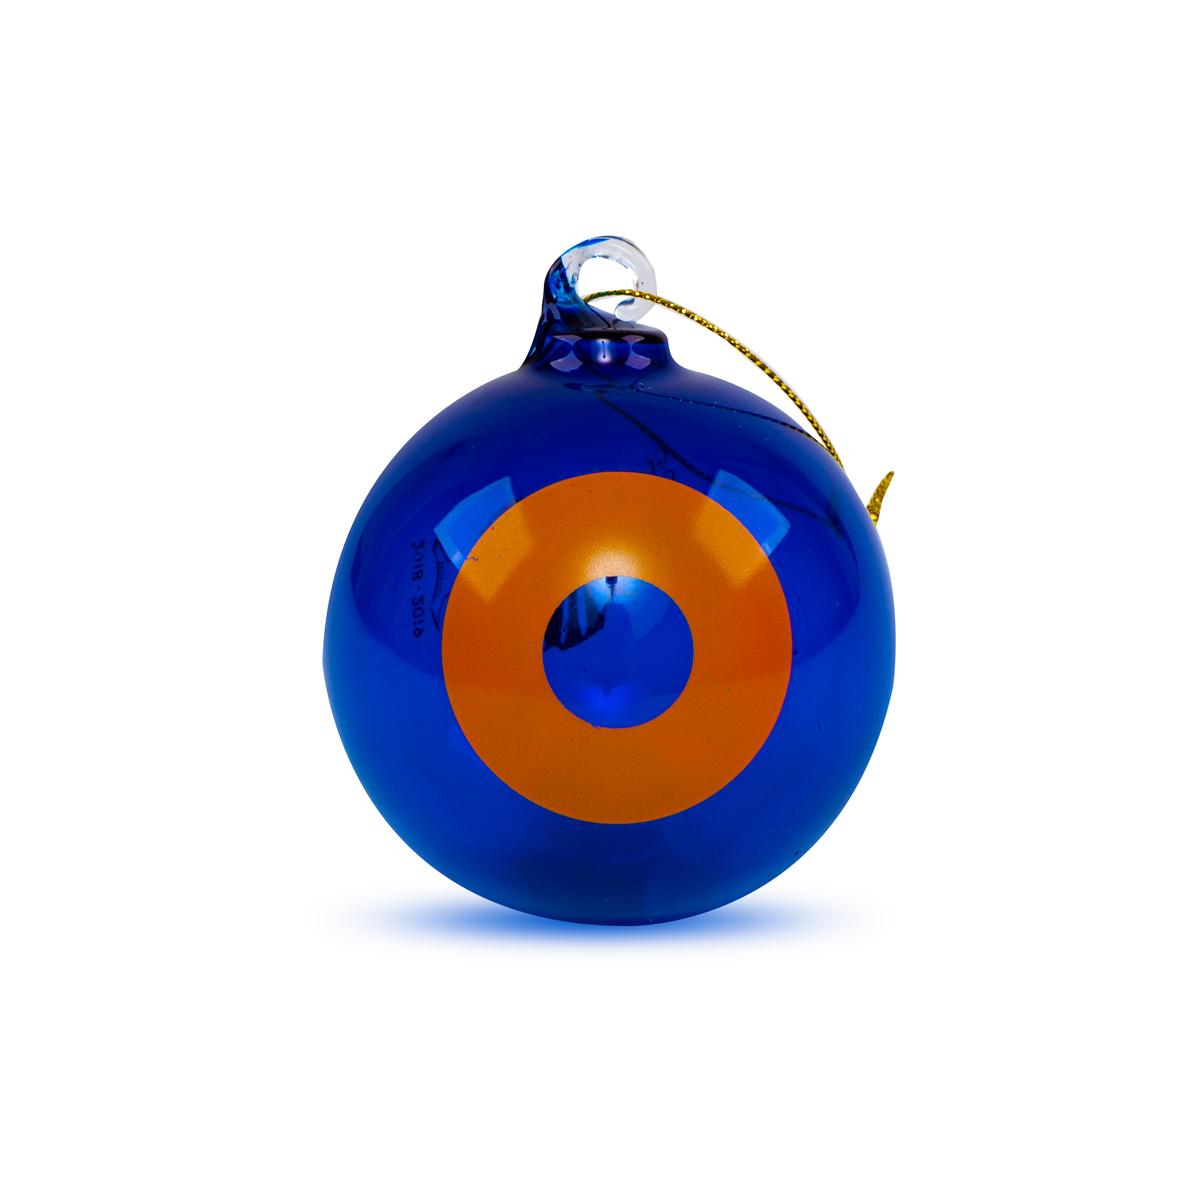 NYE 2018 Run Donut Ornament in Orange/Blue